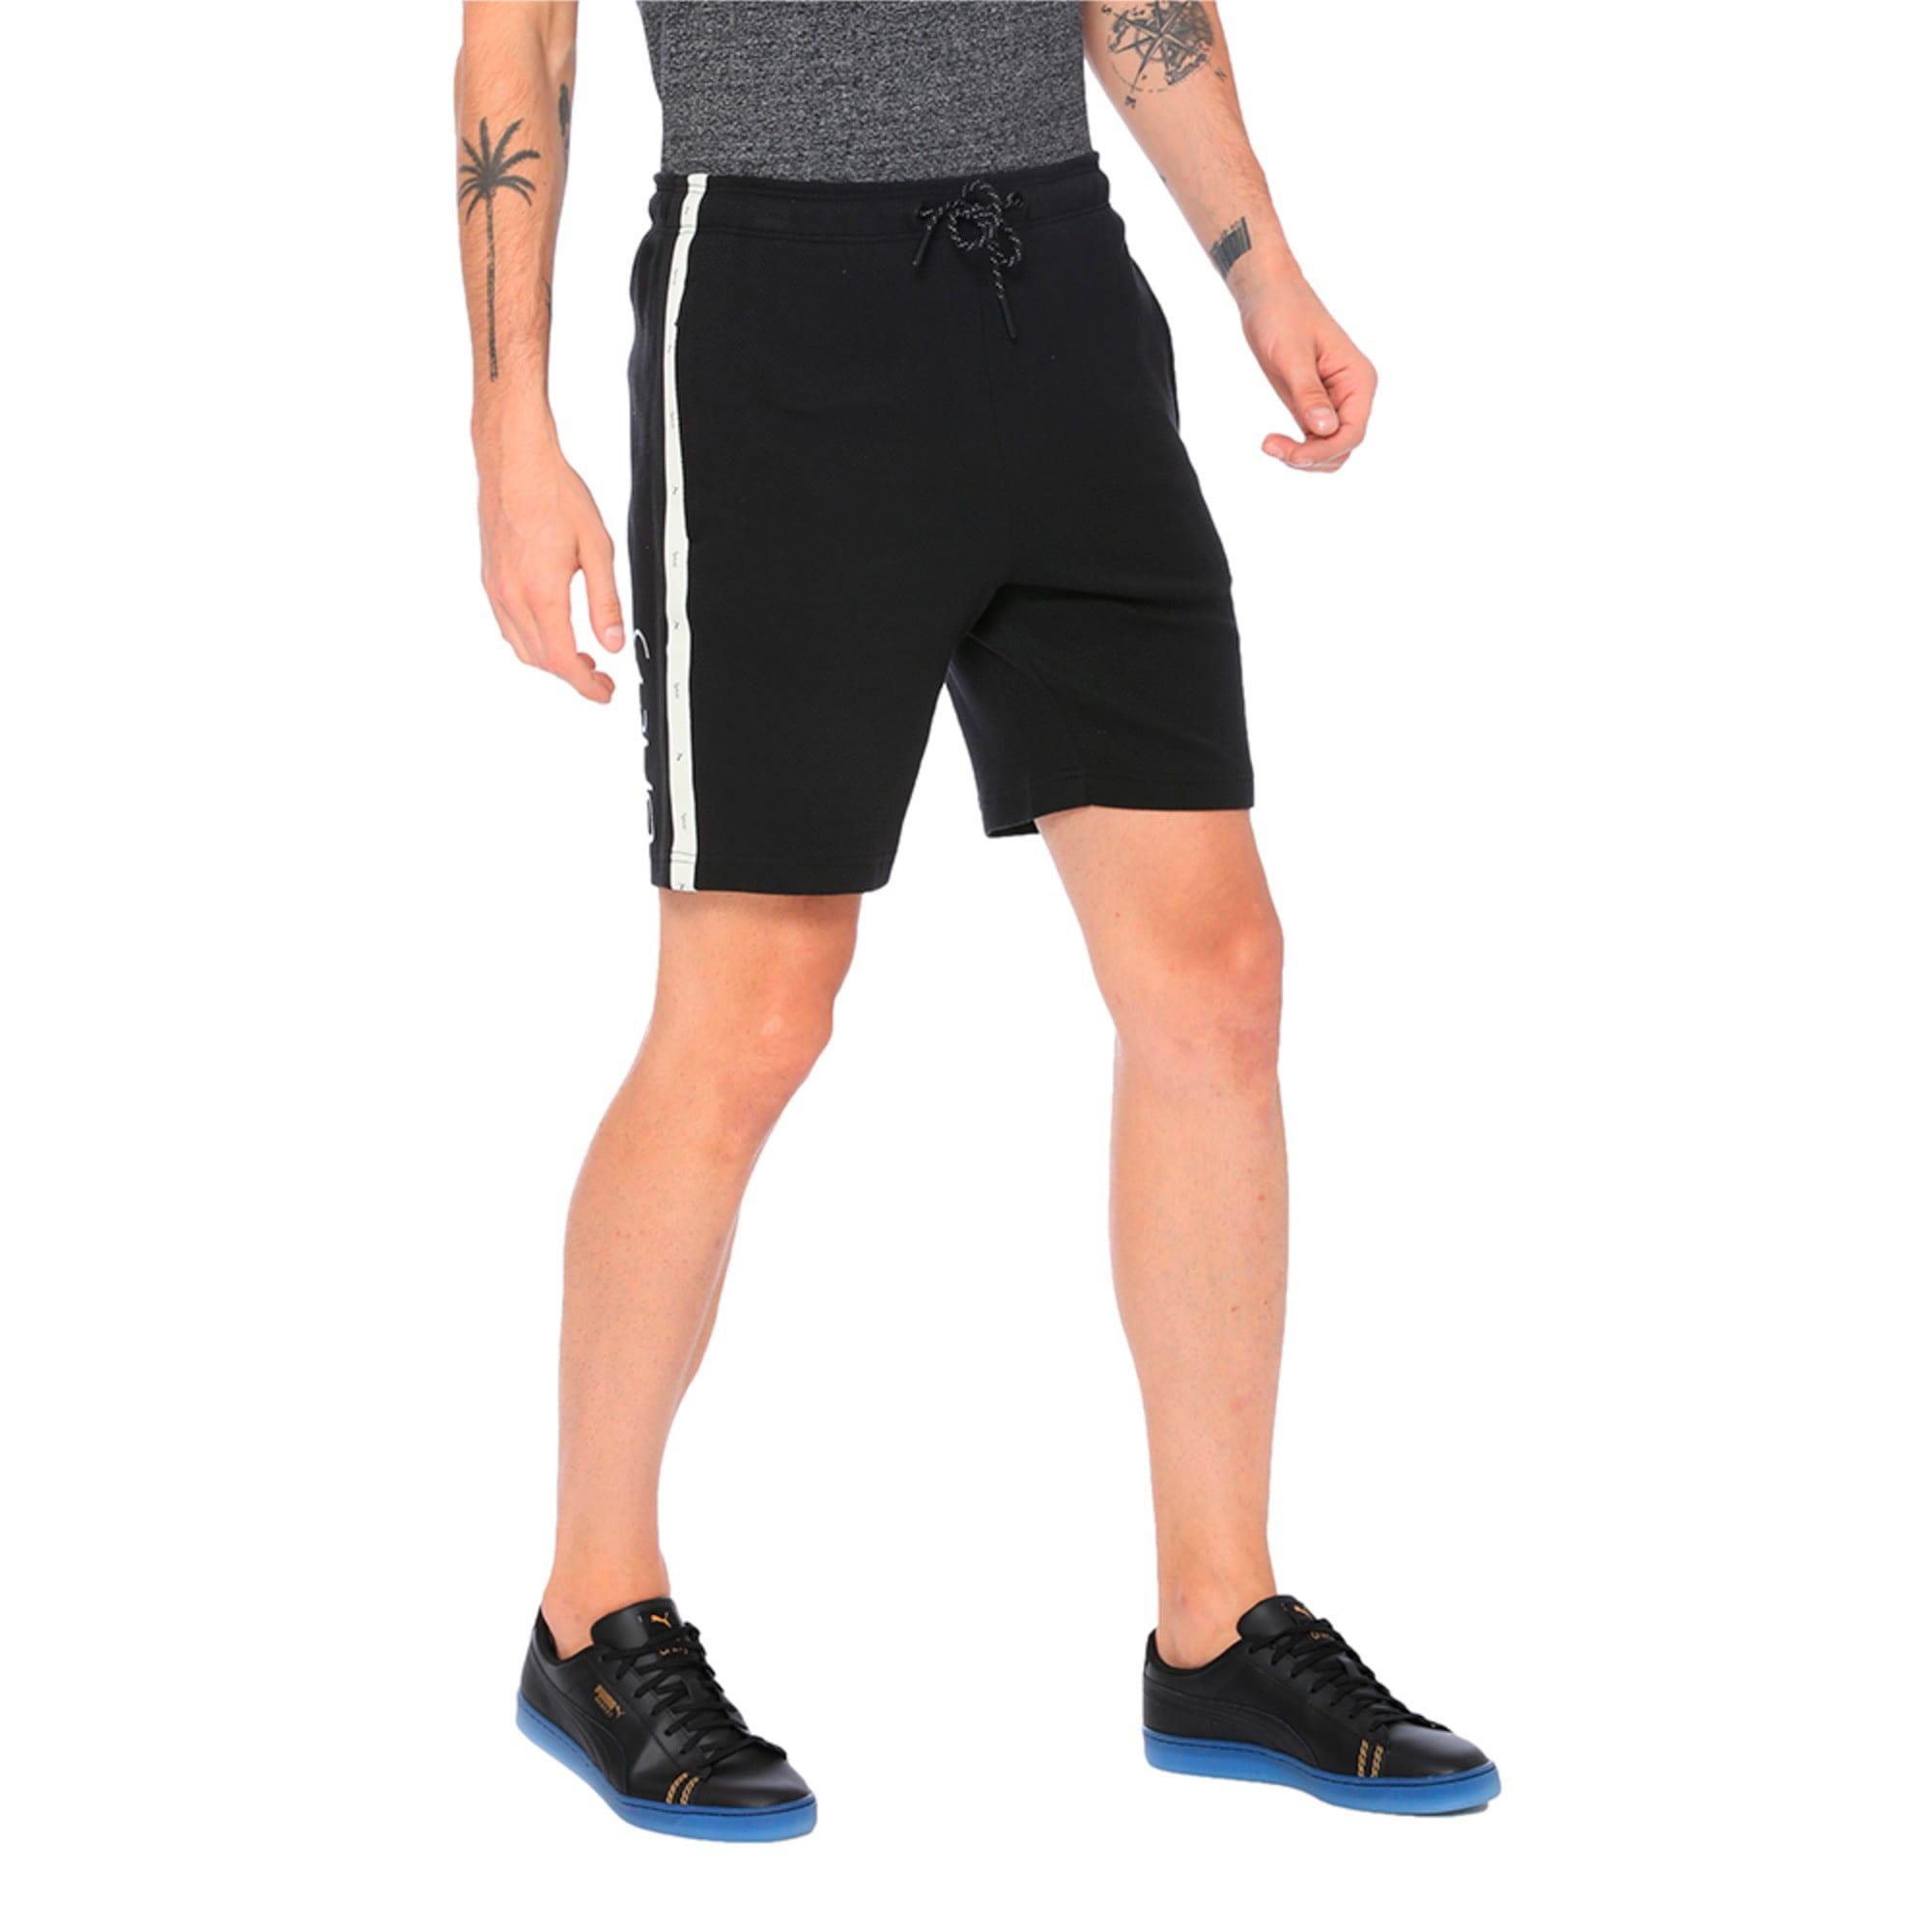 Thumbnail 2 of VK Sweat Shorts, Puma Black, medium-IND